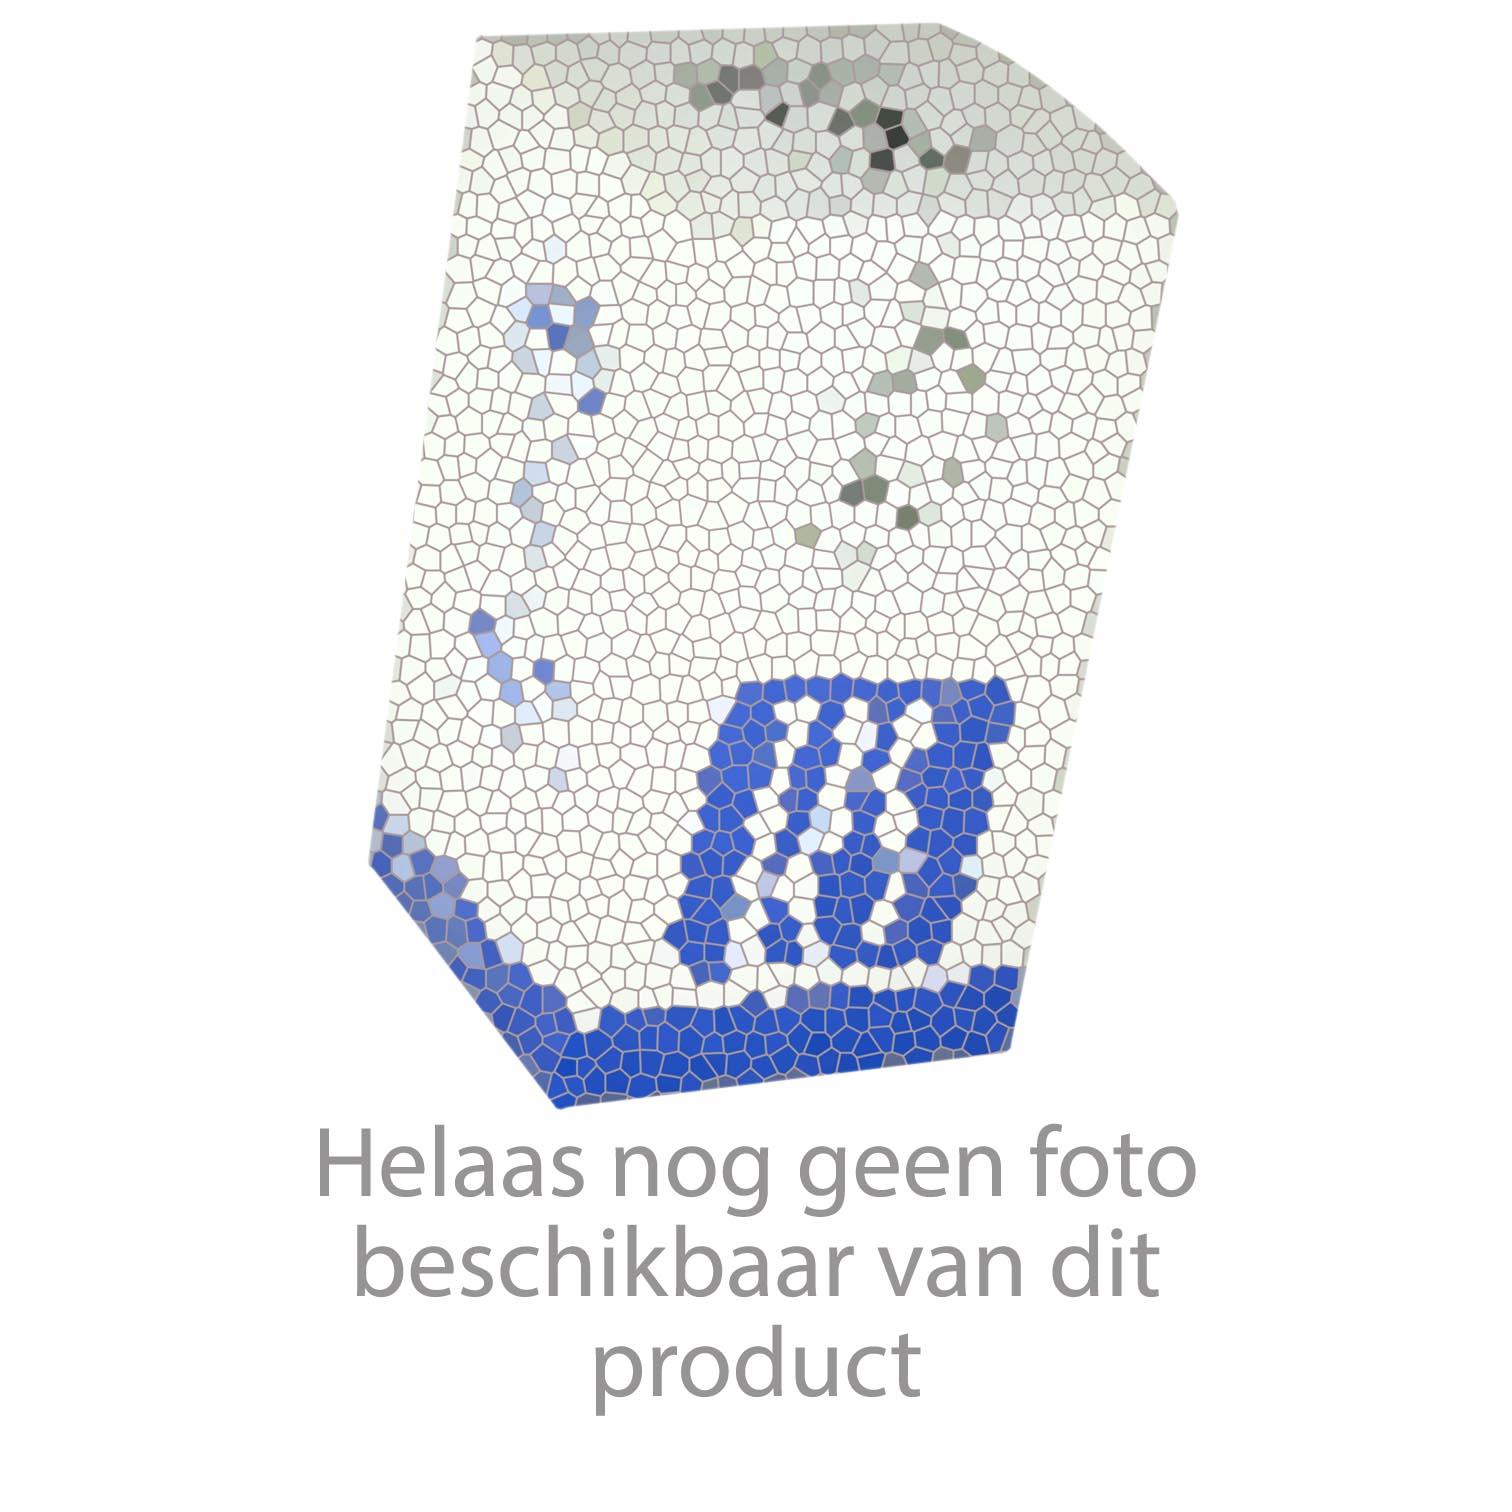 Grohe Onderdelen Allure Wastafelkraan Driegats wastafelmengkraan M-Size Artikelnummer 20193000